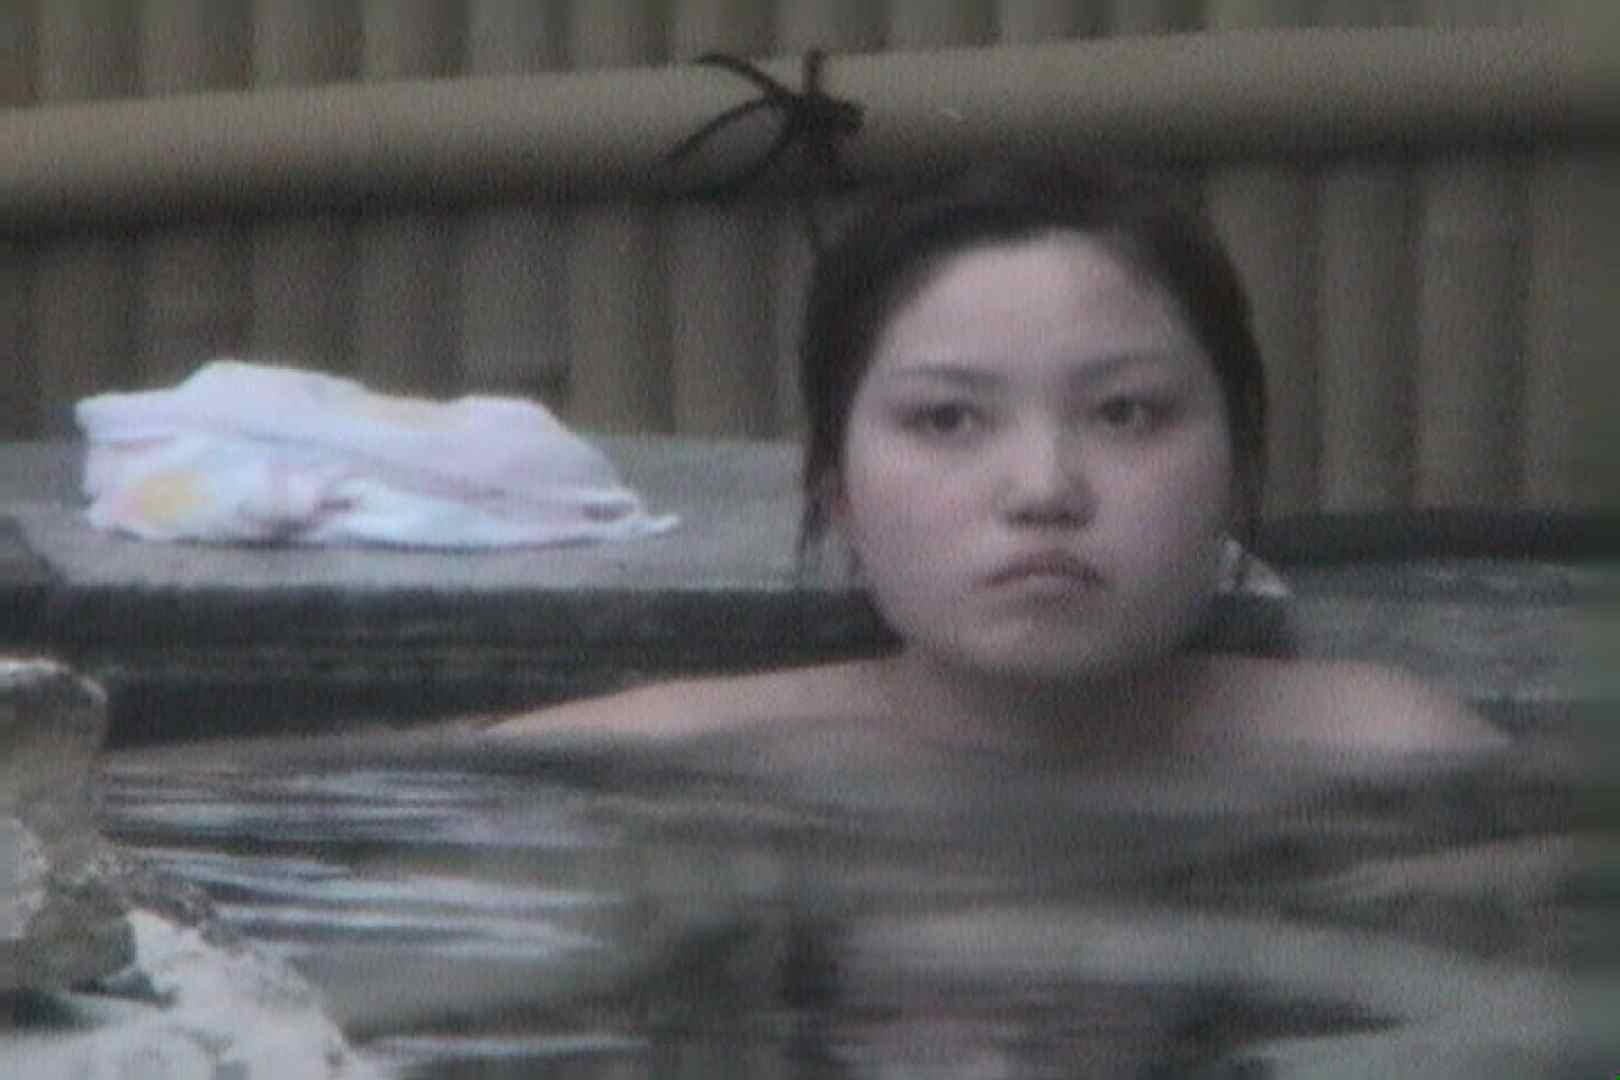 Aquaな露天風呂Vol.602 露天風呂編 | 盗撮シリーズ  83PIX 63